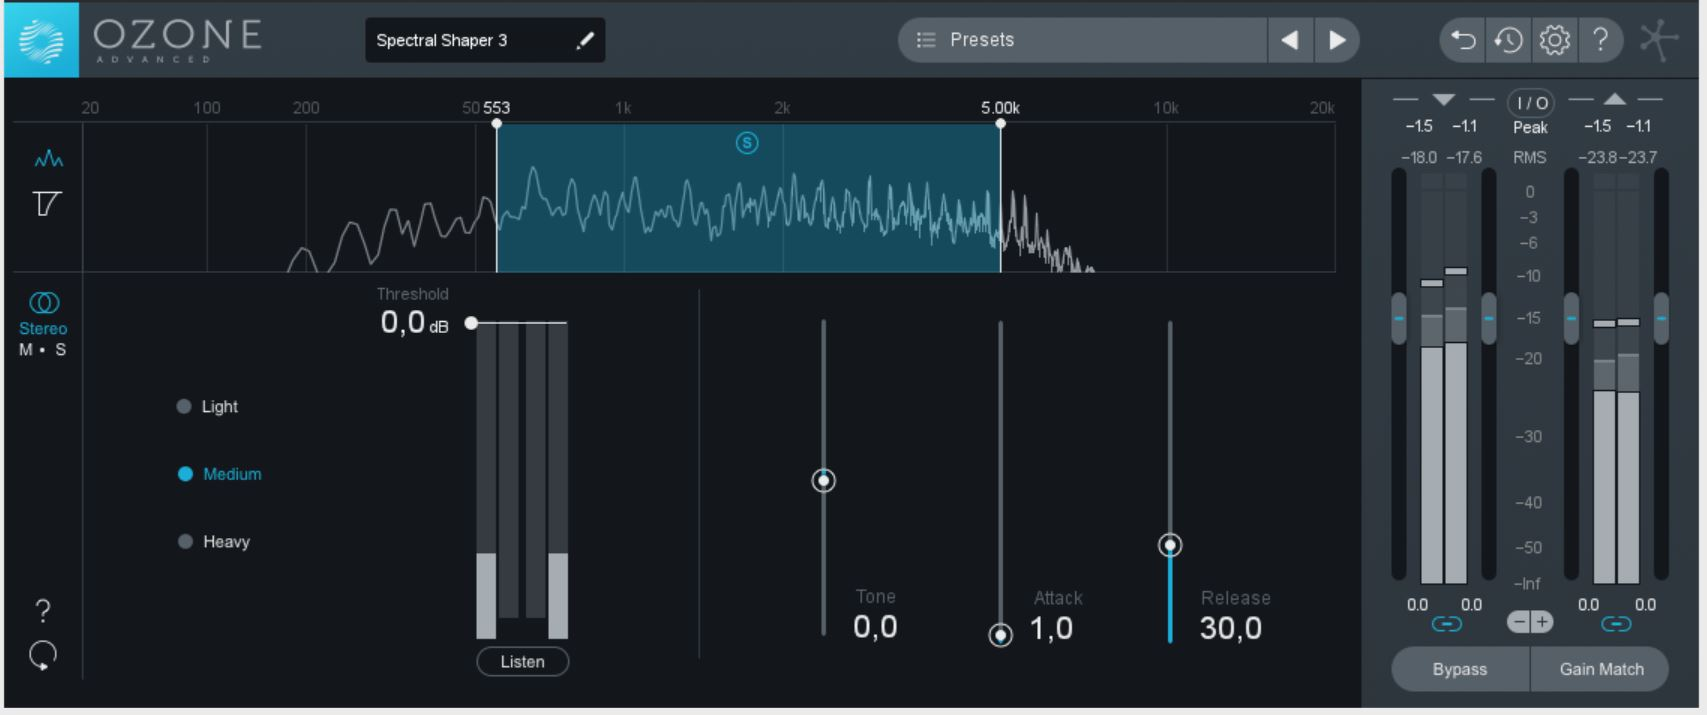 Recording und Studiotechnik: Tutorial zu iZotope Ozone 8 Spectral Shaper als Lo-Fi-Effekt